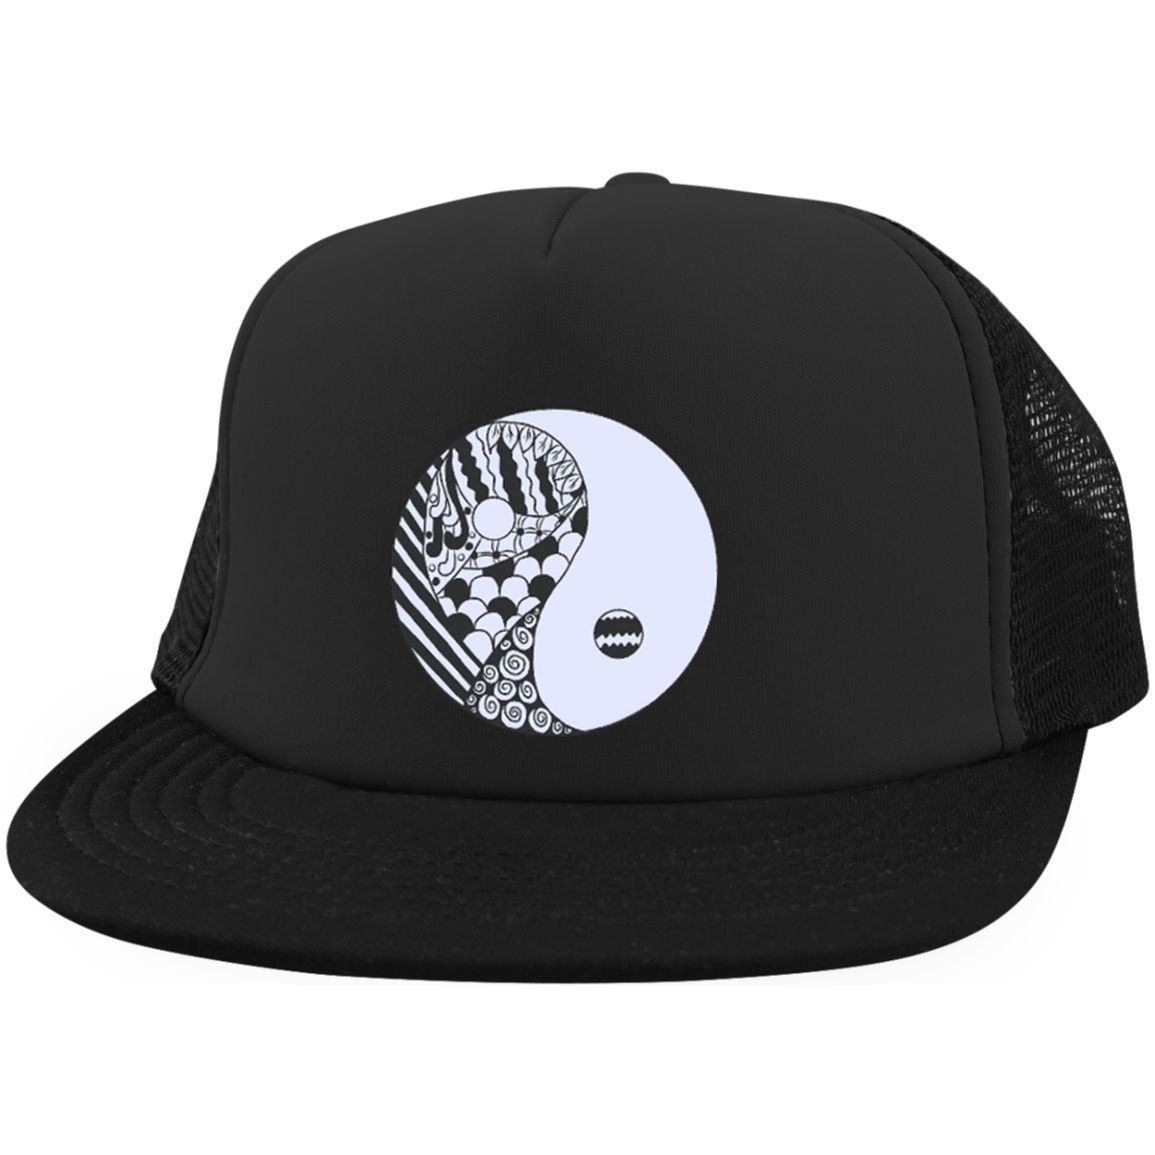 Yin Yang Snapback Cap | Products | Pinterest